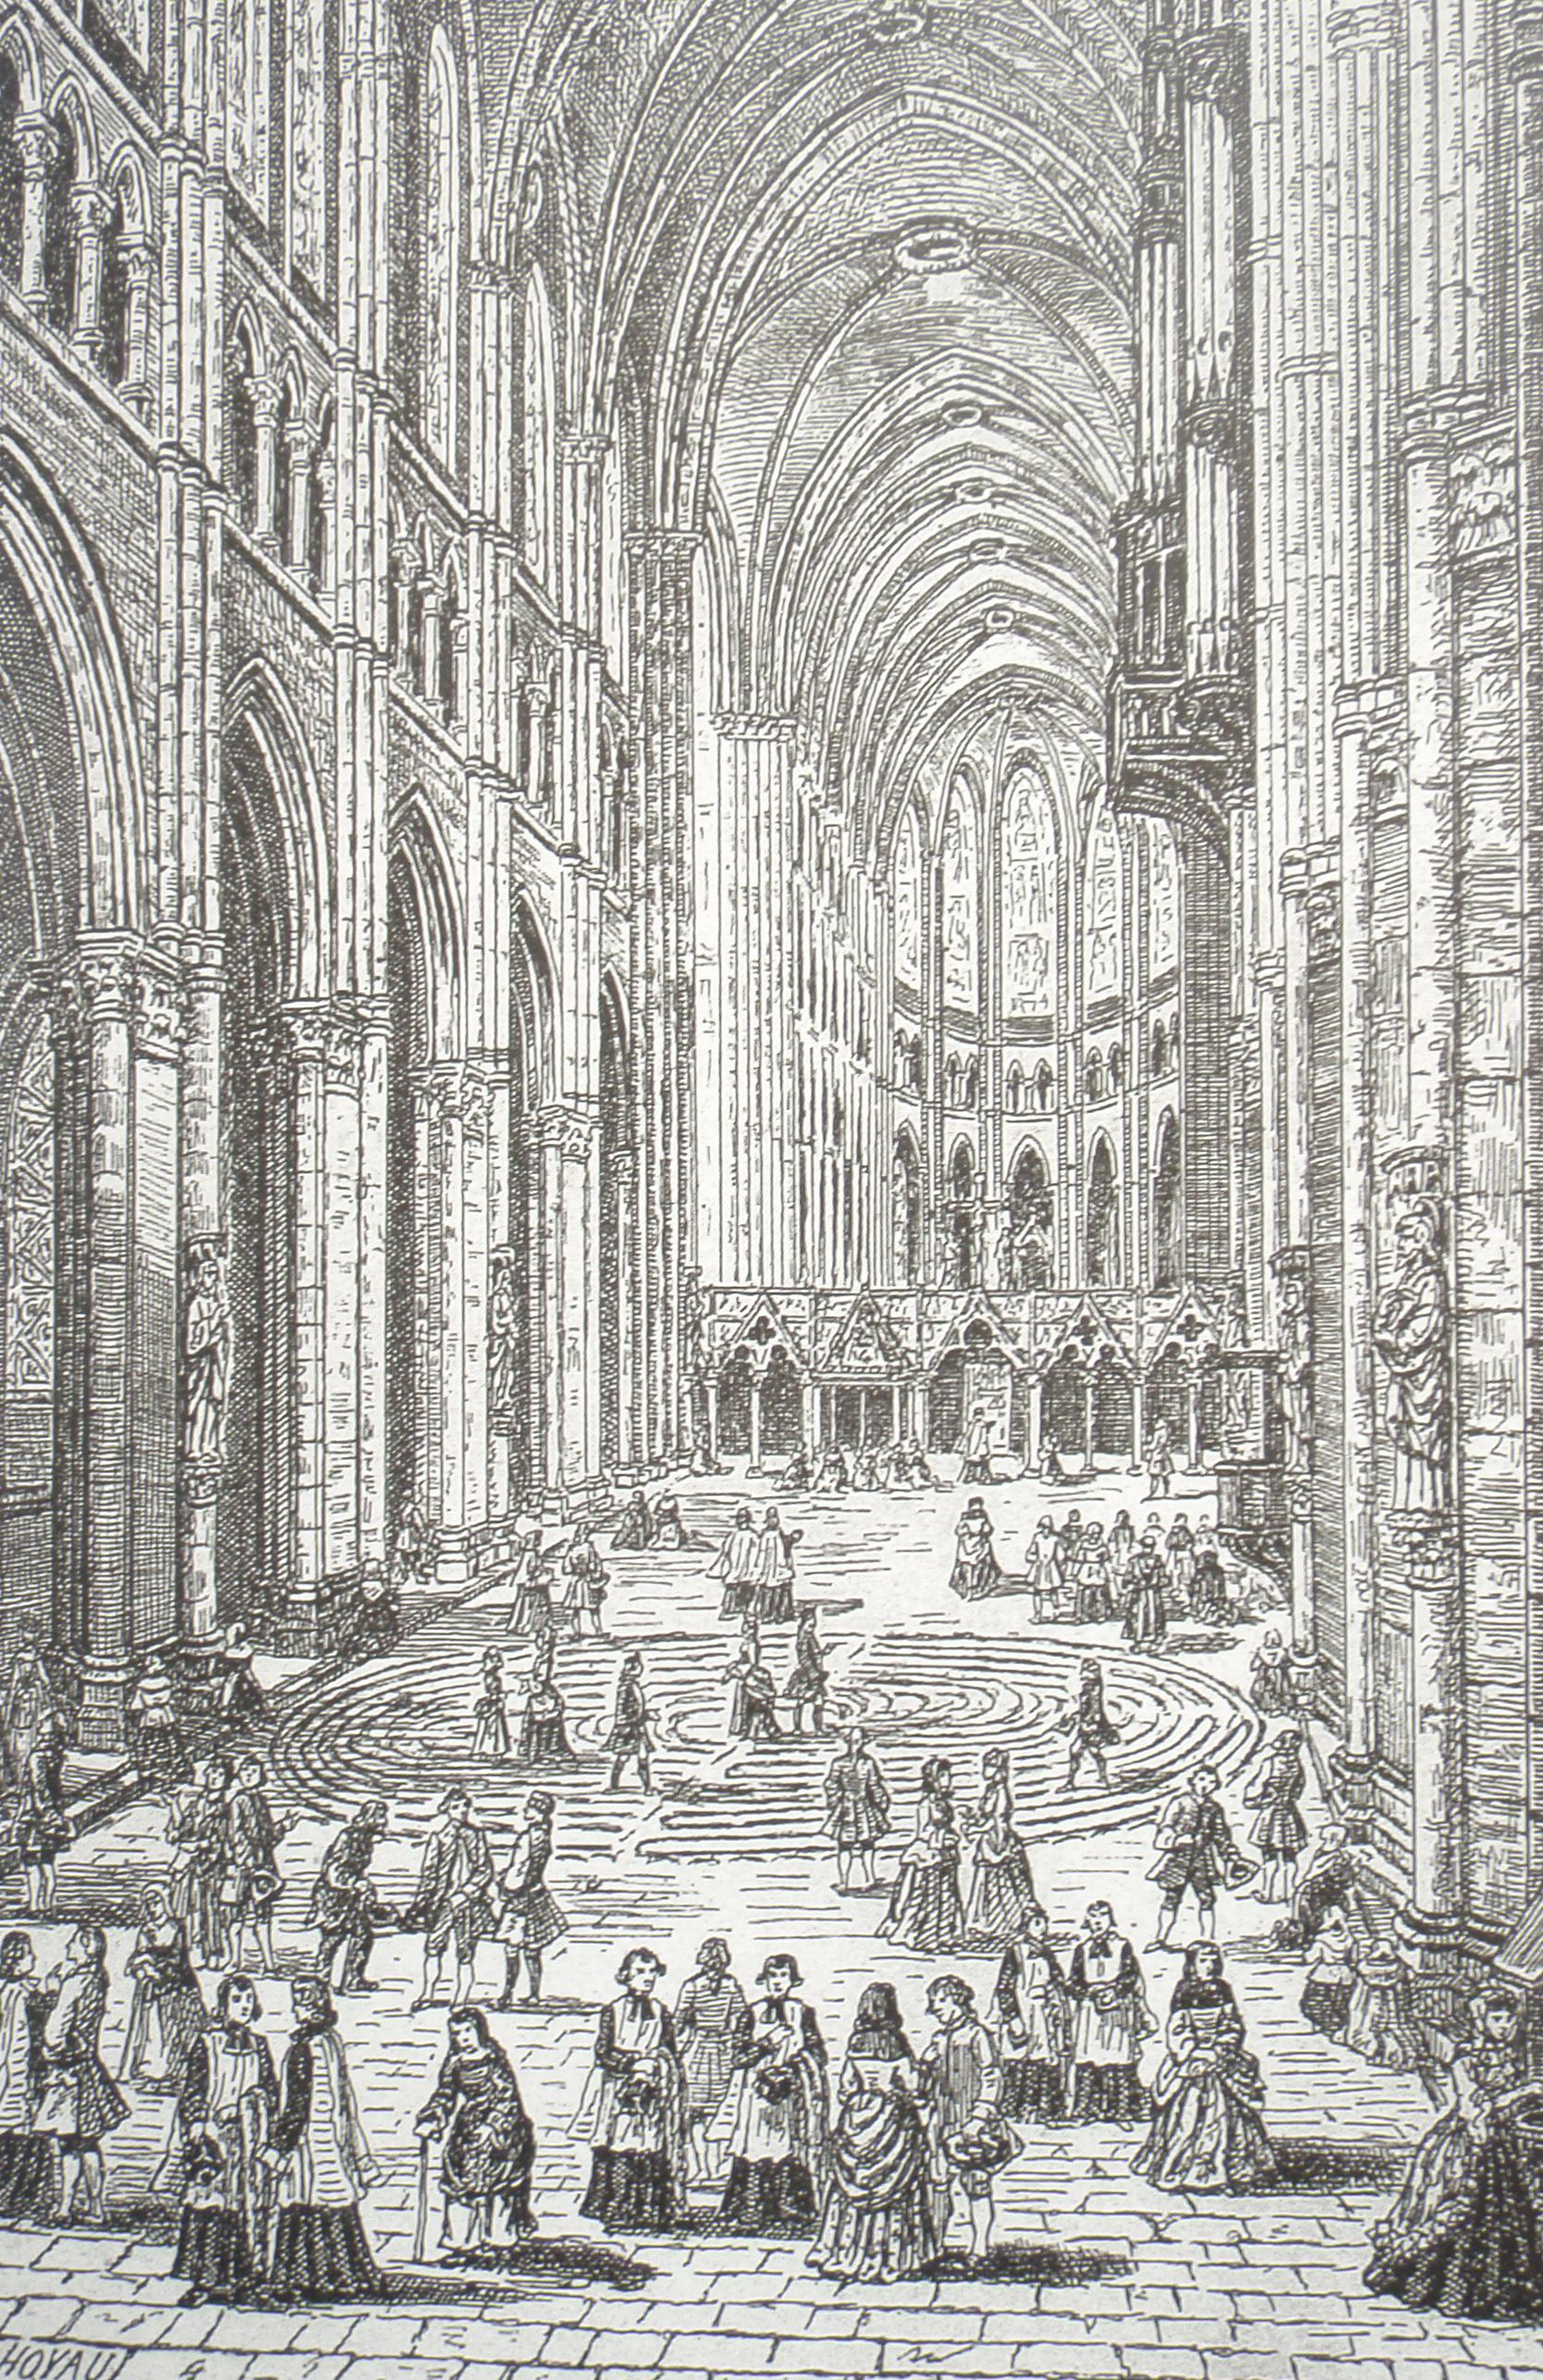 https://i1.wp.com/upload.wikimedia.org/wikipedia/commons/2/20/Inneres_der_Kathedrale.jpg